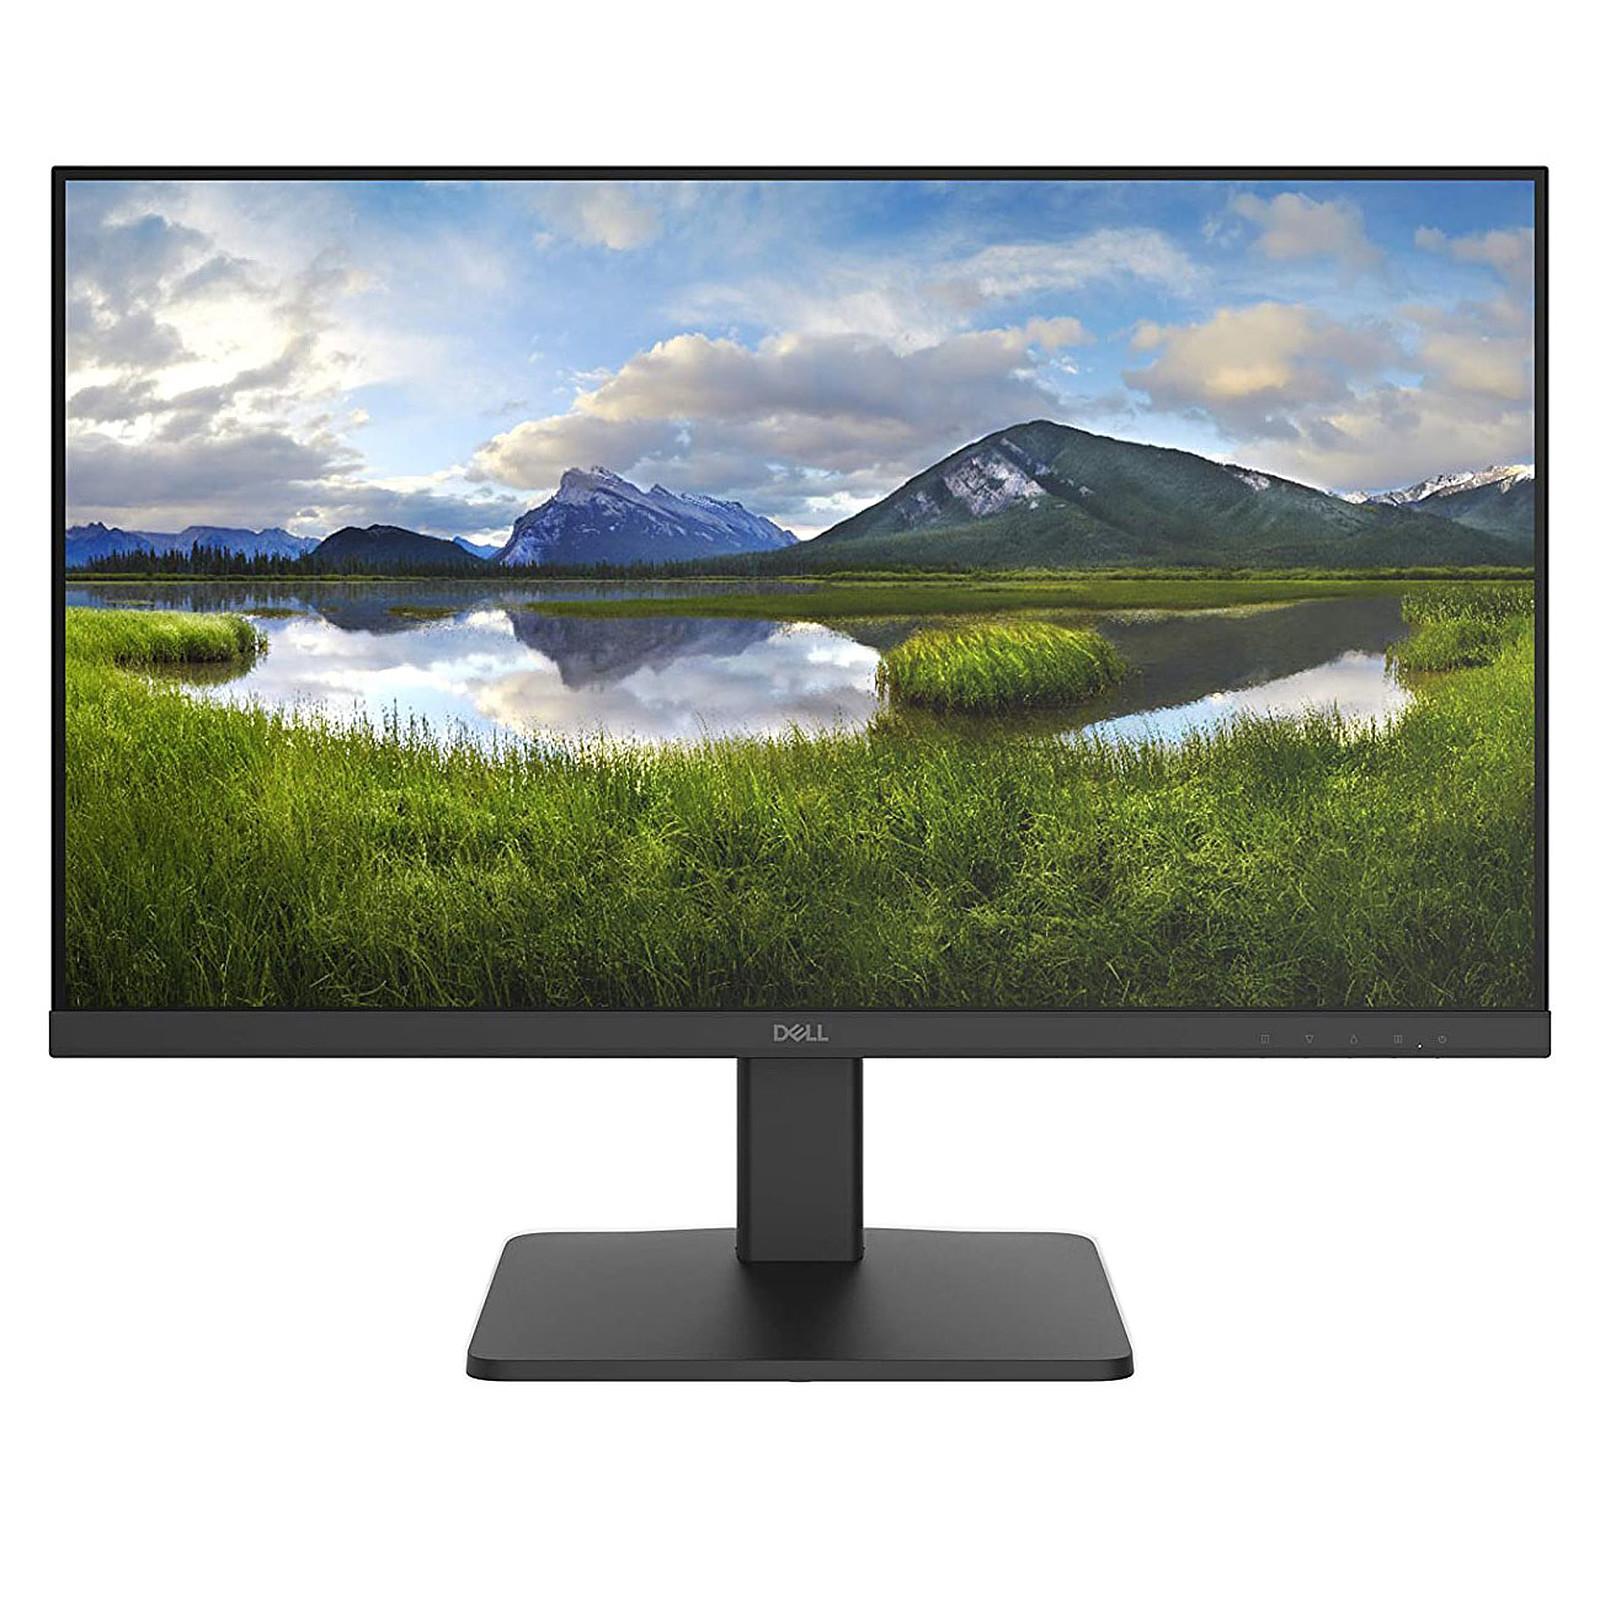 "Ecran PC 27"" Dell D2721H - Full HD, Dalle IPS, 75 Hz, 8 ms, HDMI, Fixation VESA"